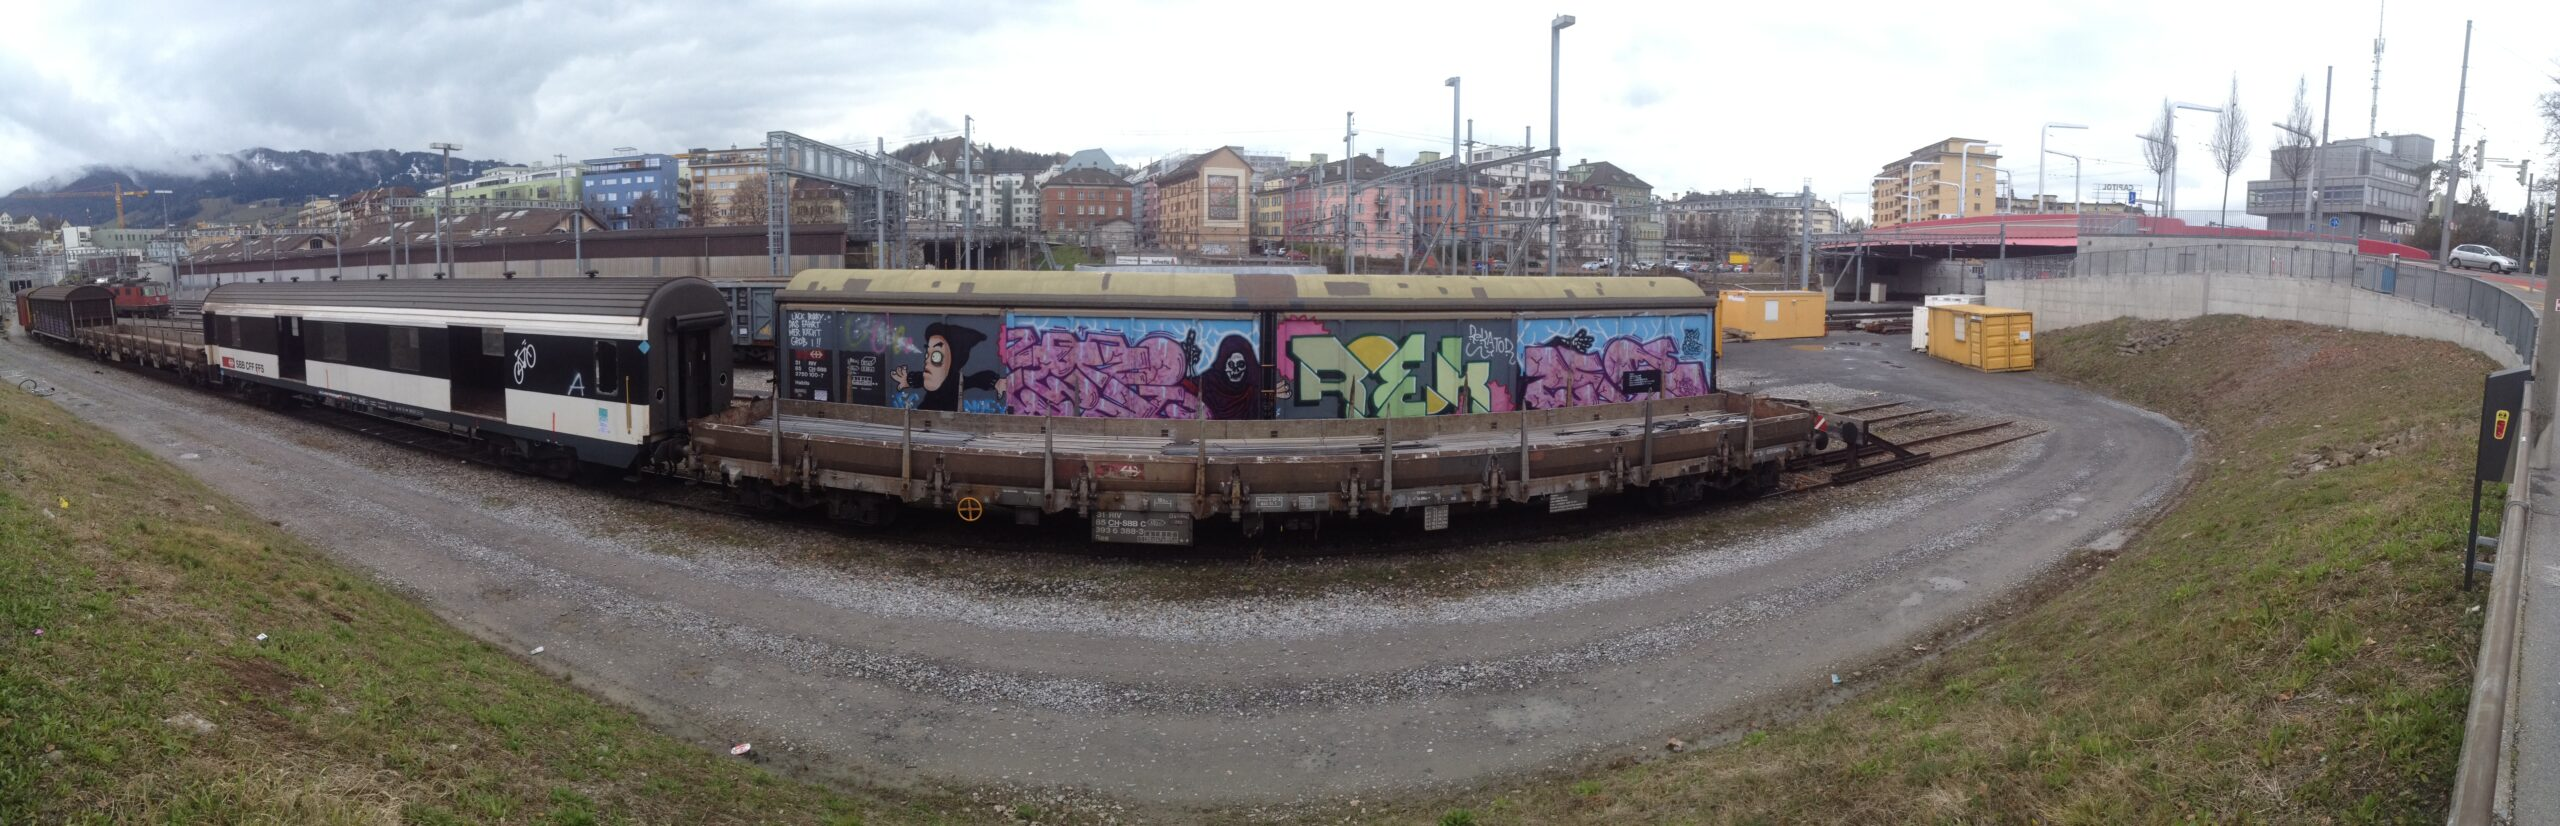 Graffiti Bahnhof Luzern